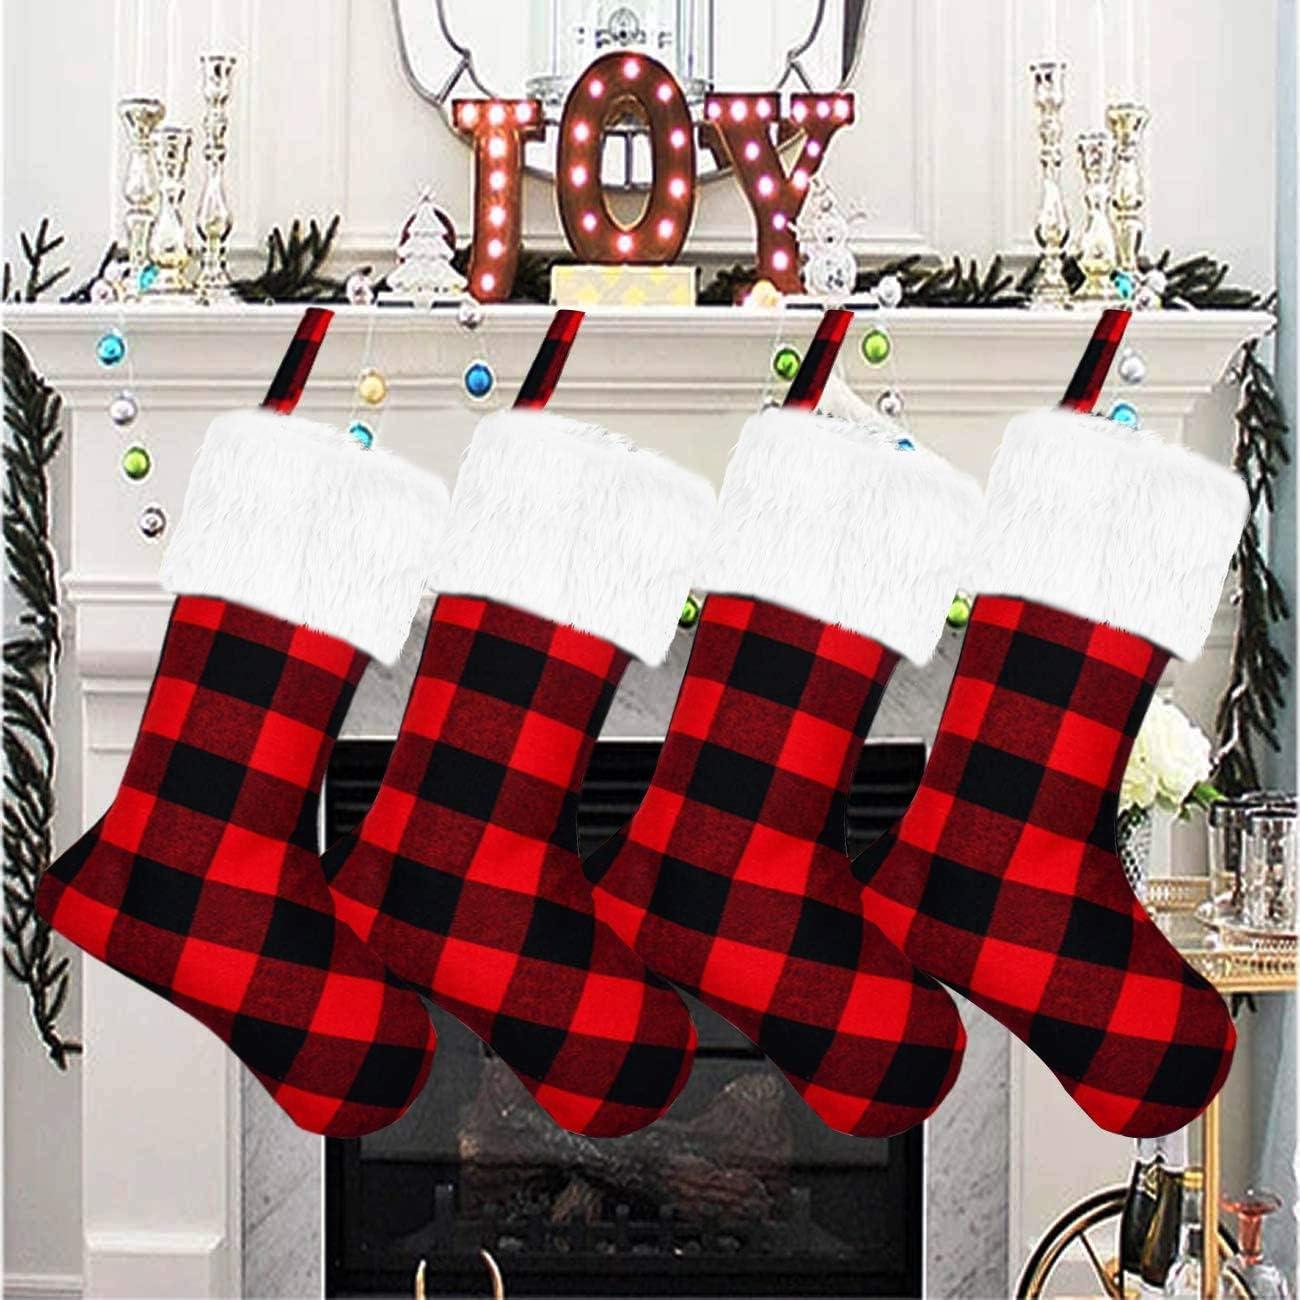 Senneny Christmas Stockings- 4 Pack Super sale period limited Buffalo 18